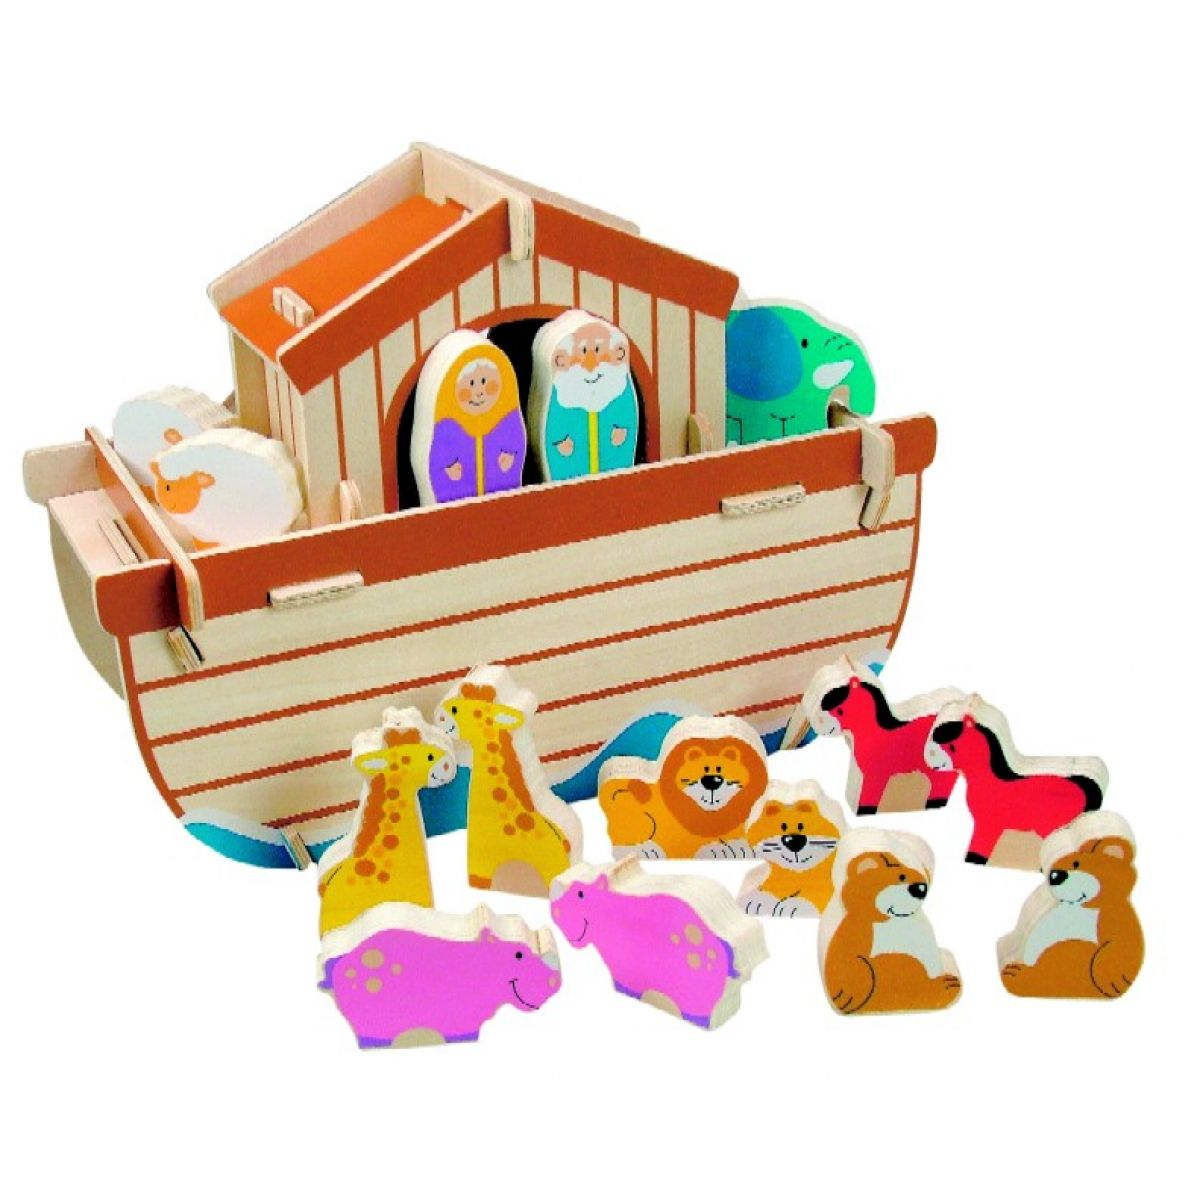 WOODY 90025 Skládací Noemova archa 28 dílů